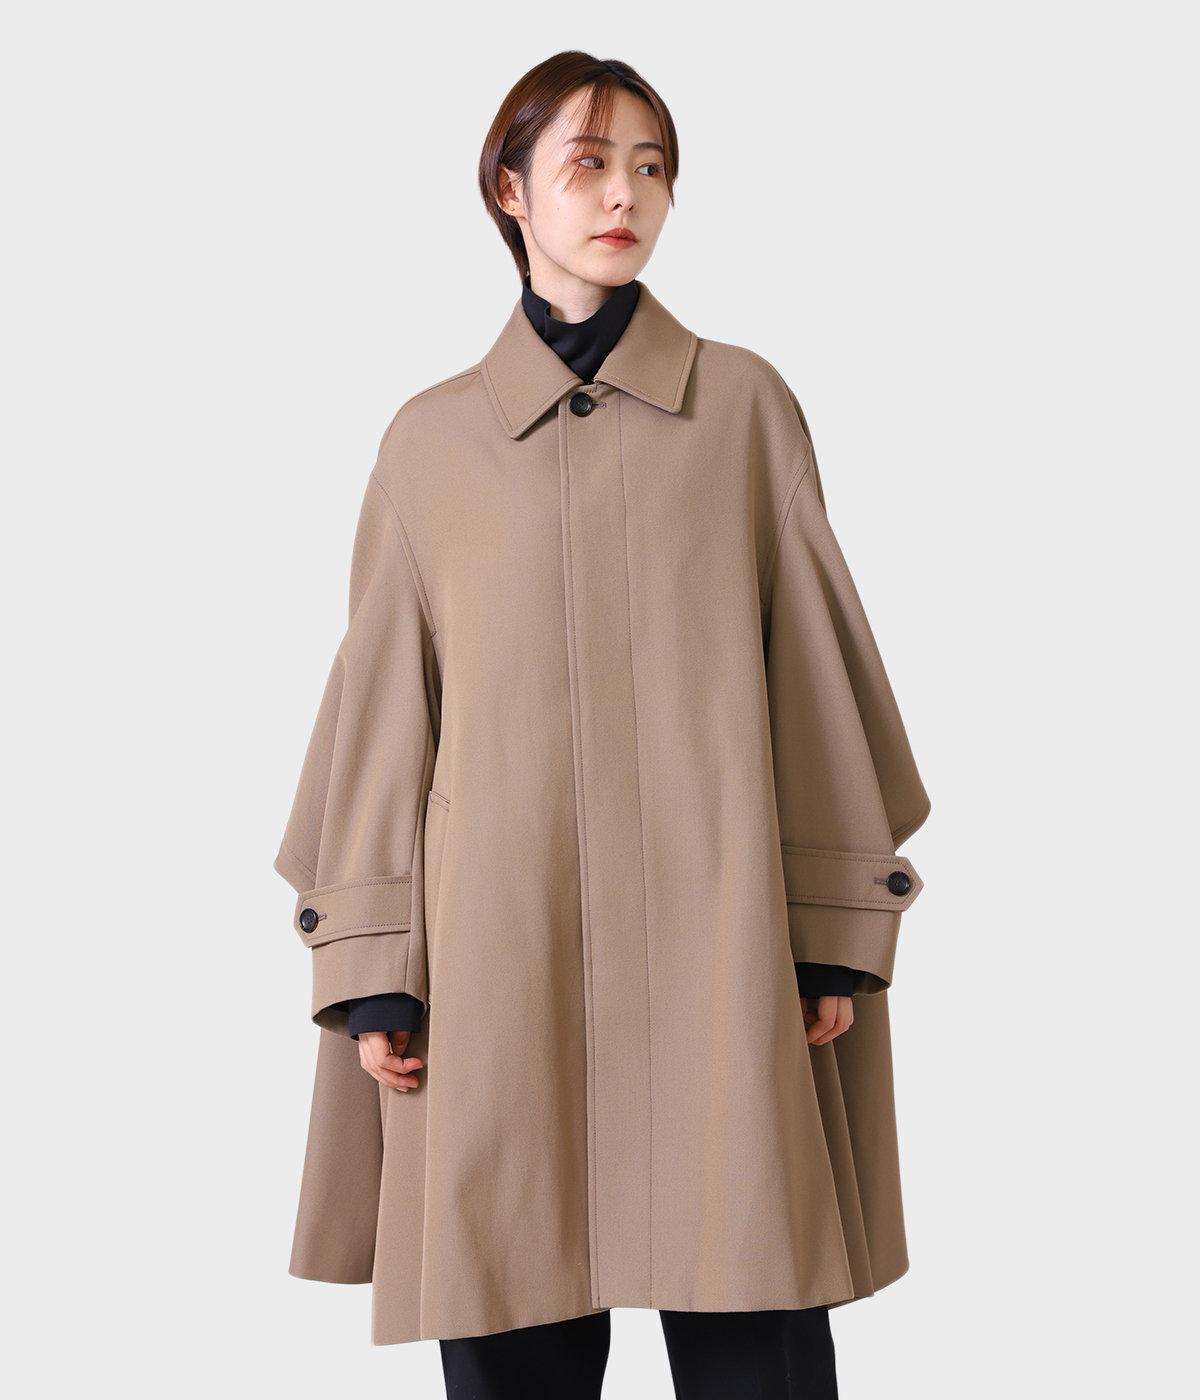 model(169cm) 着用サイズ:36